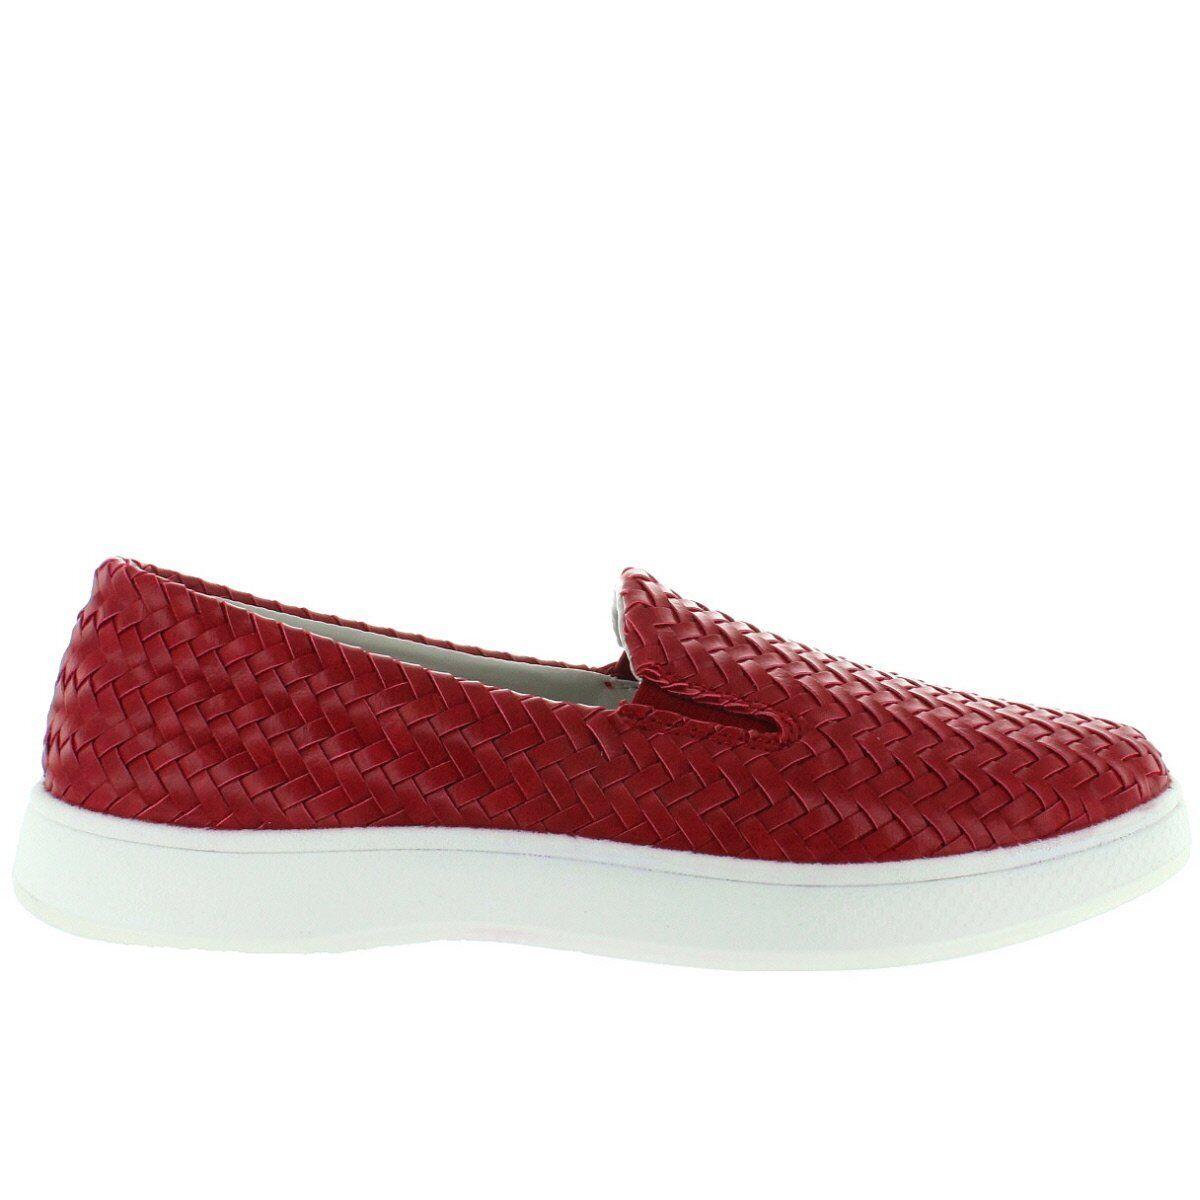 Aureus Claire - Cherry Woven Slip-On Sneaker